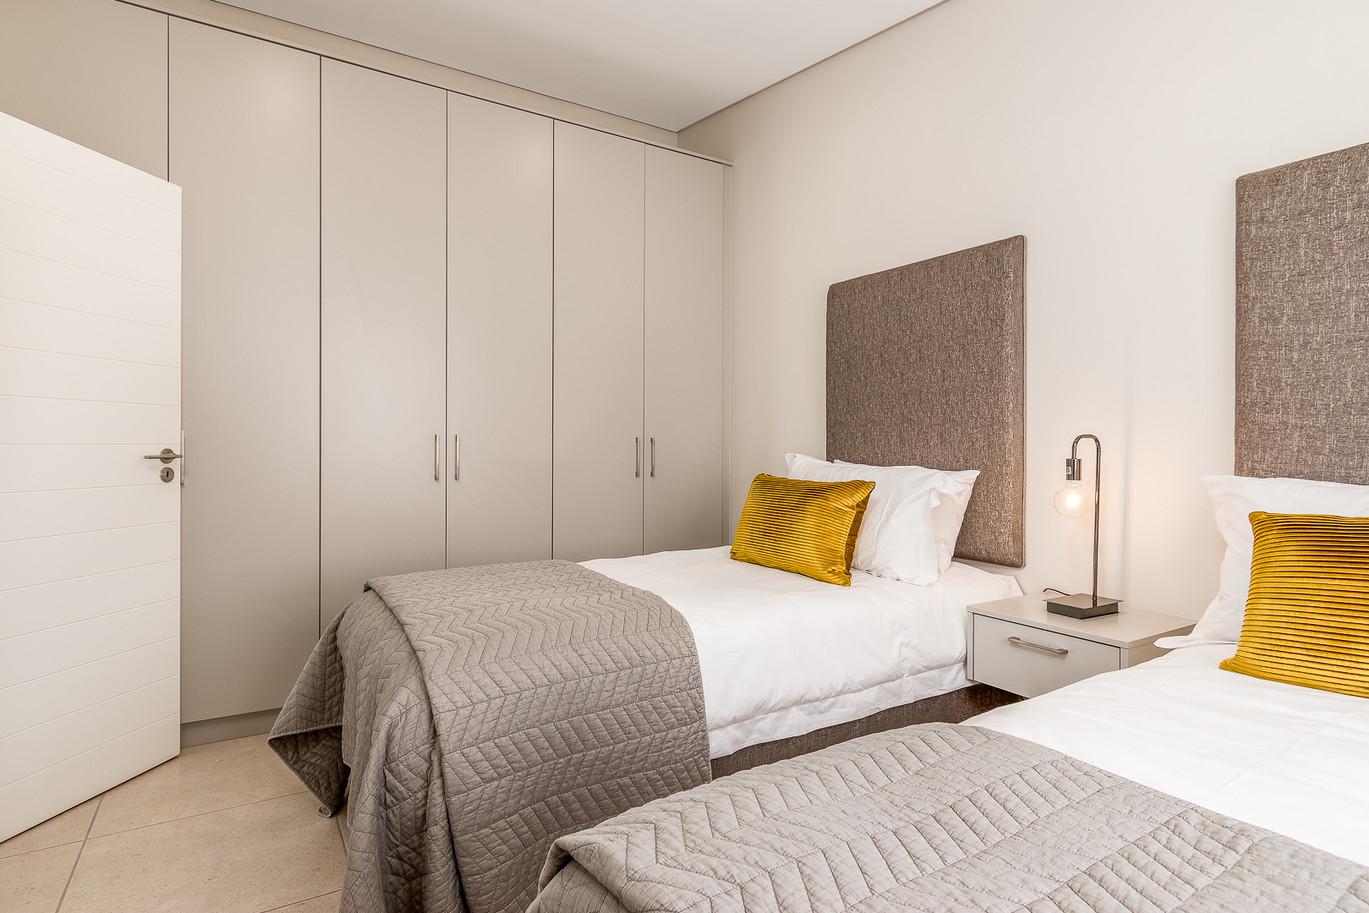 Greystone Bedroom 3